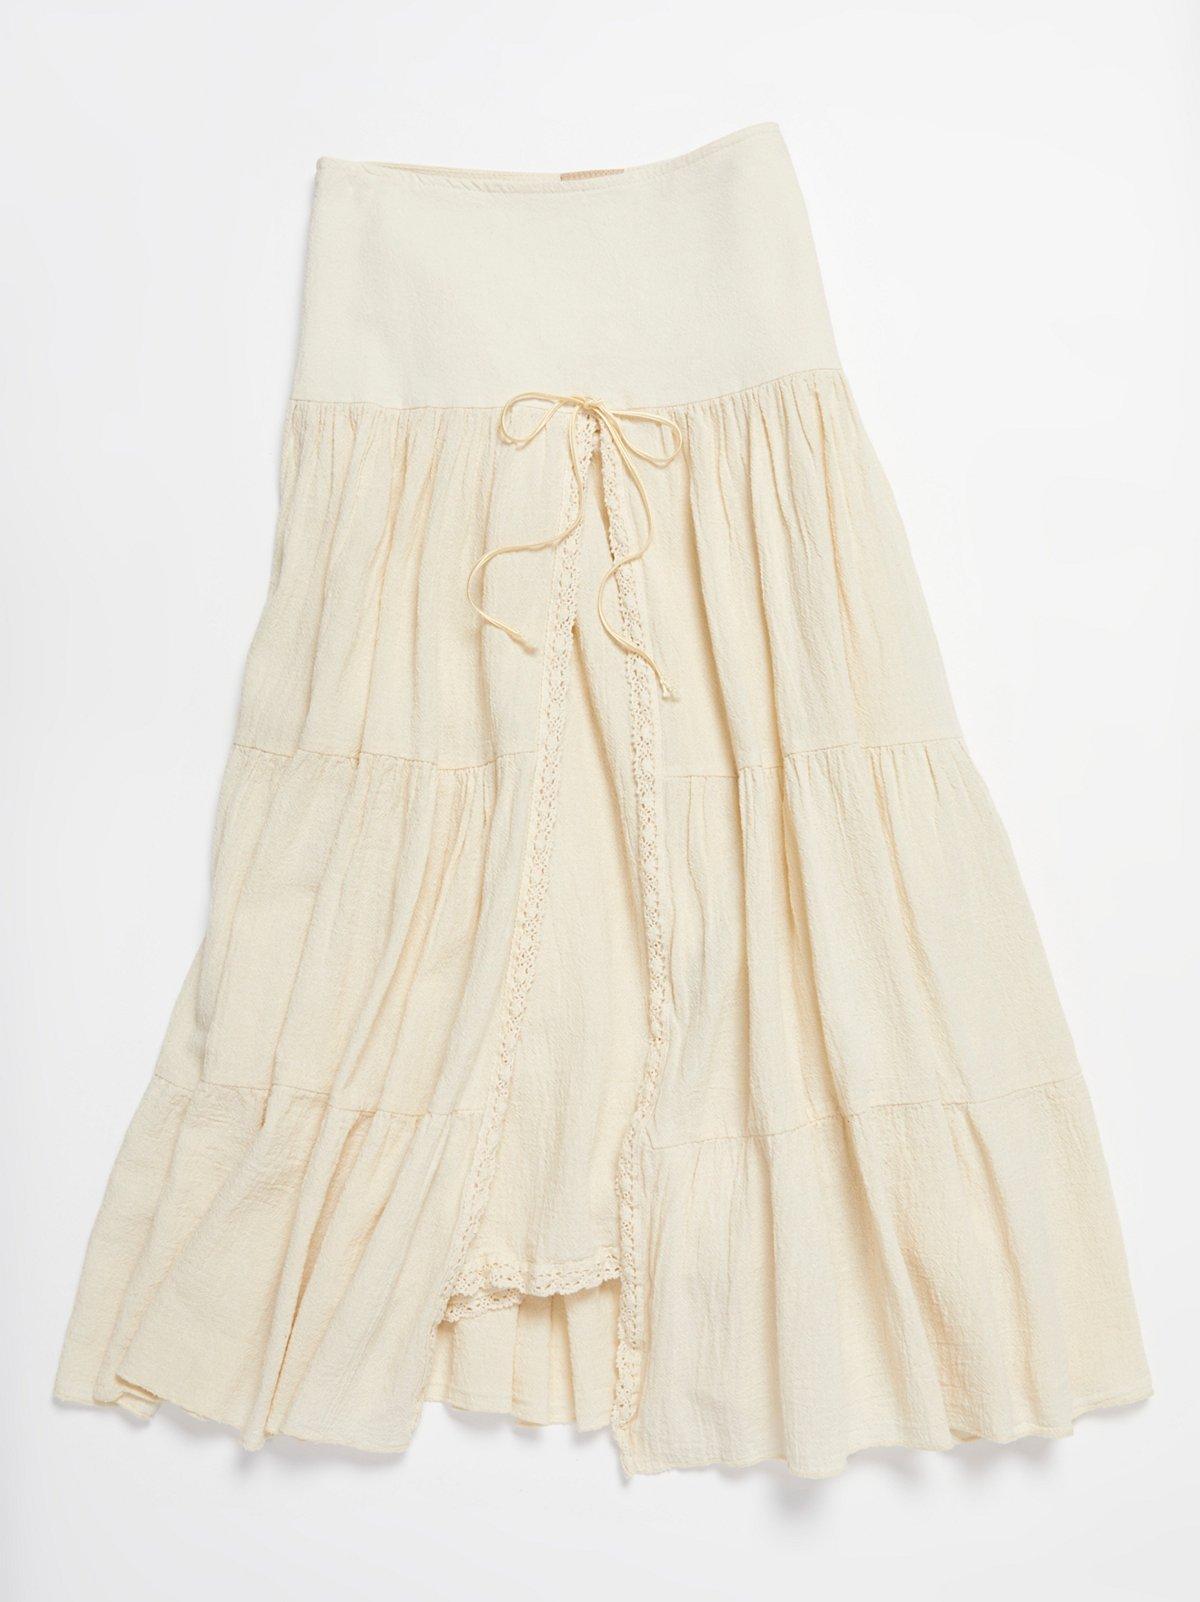 Vintage 1980s Gauze Skirt